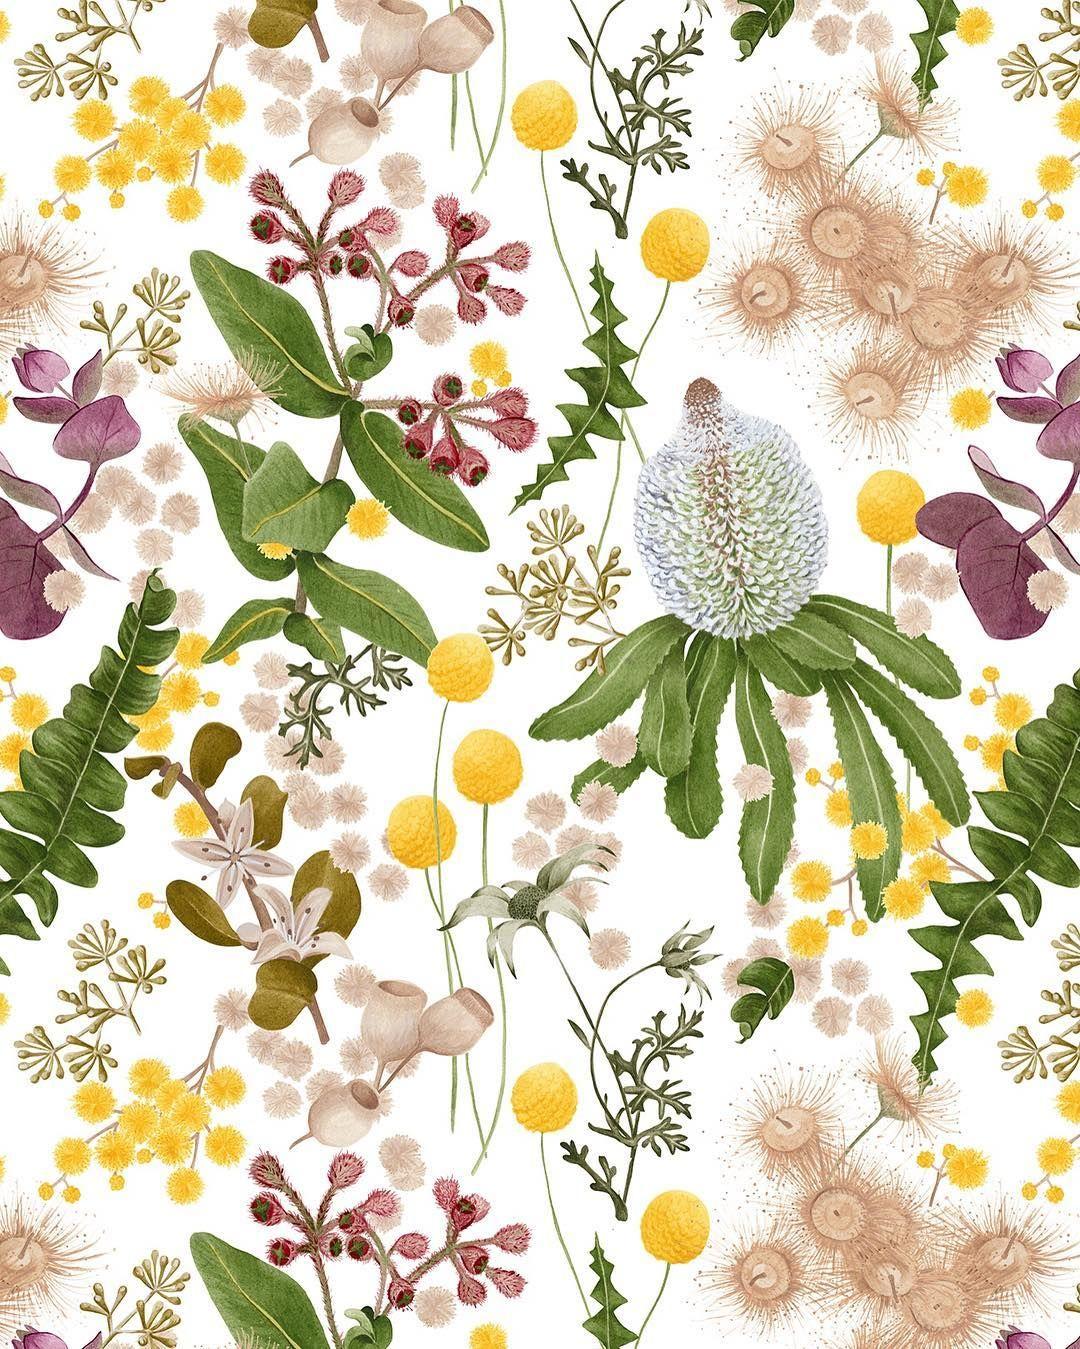 Botanical wallpaper for haymespaint Colour Library Vol 3